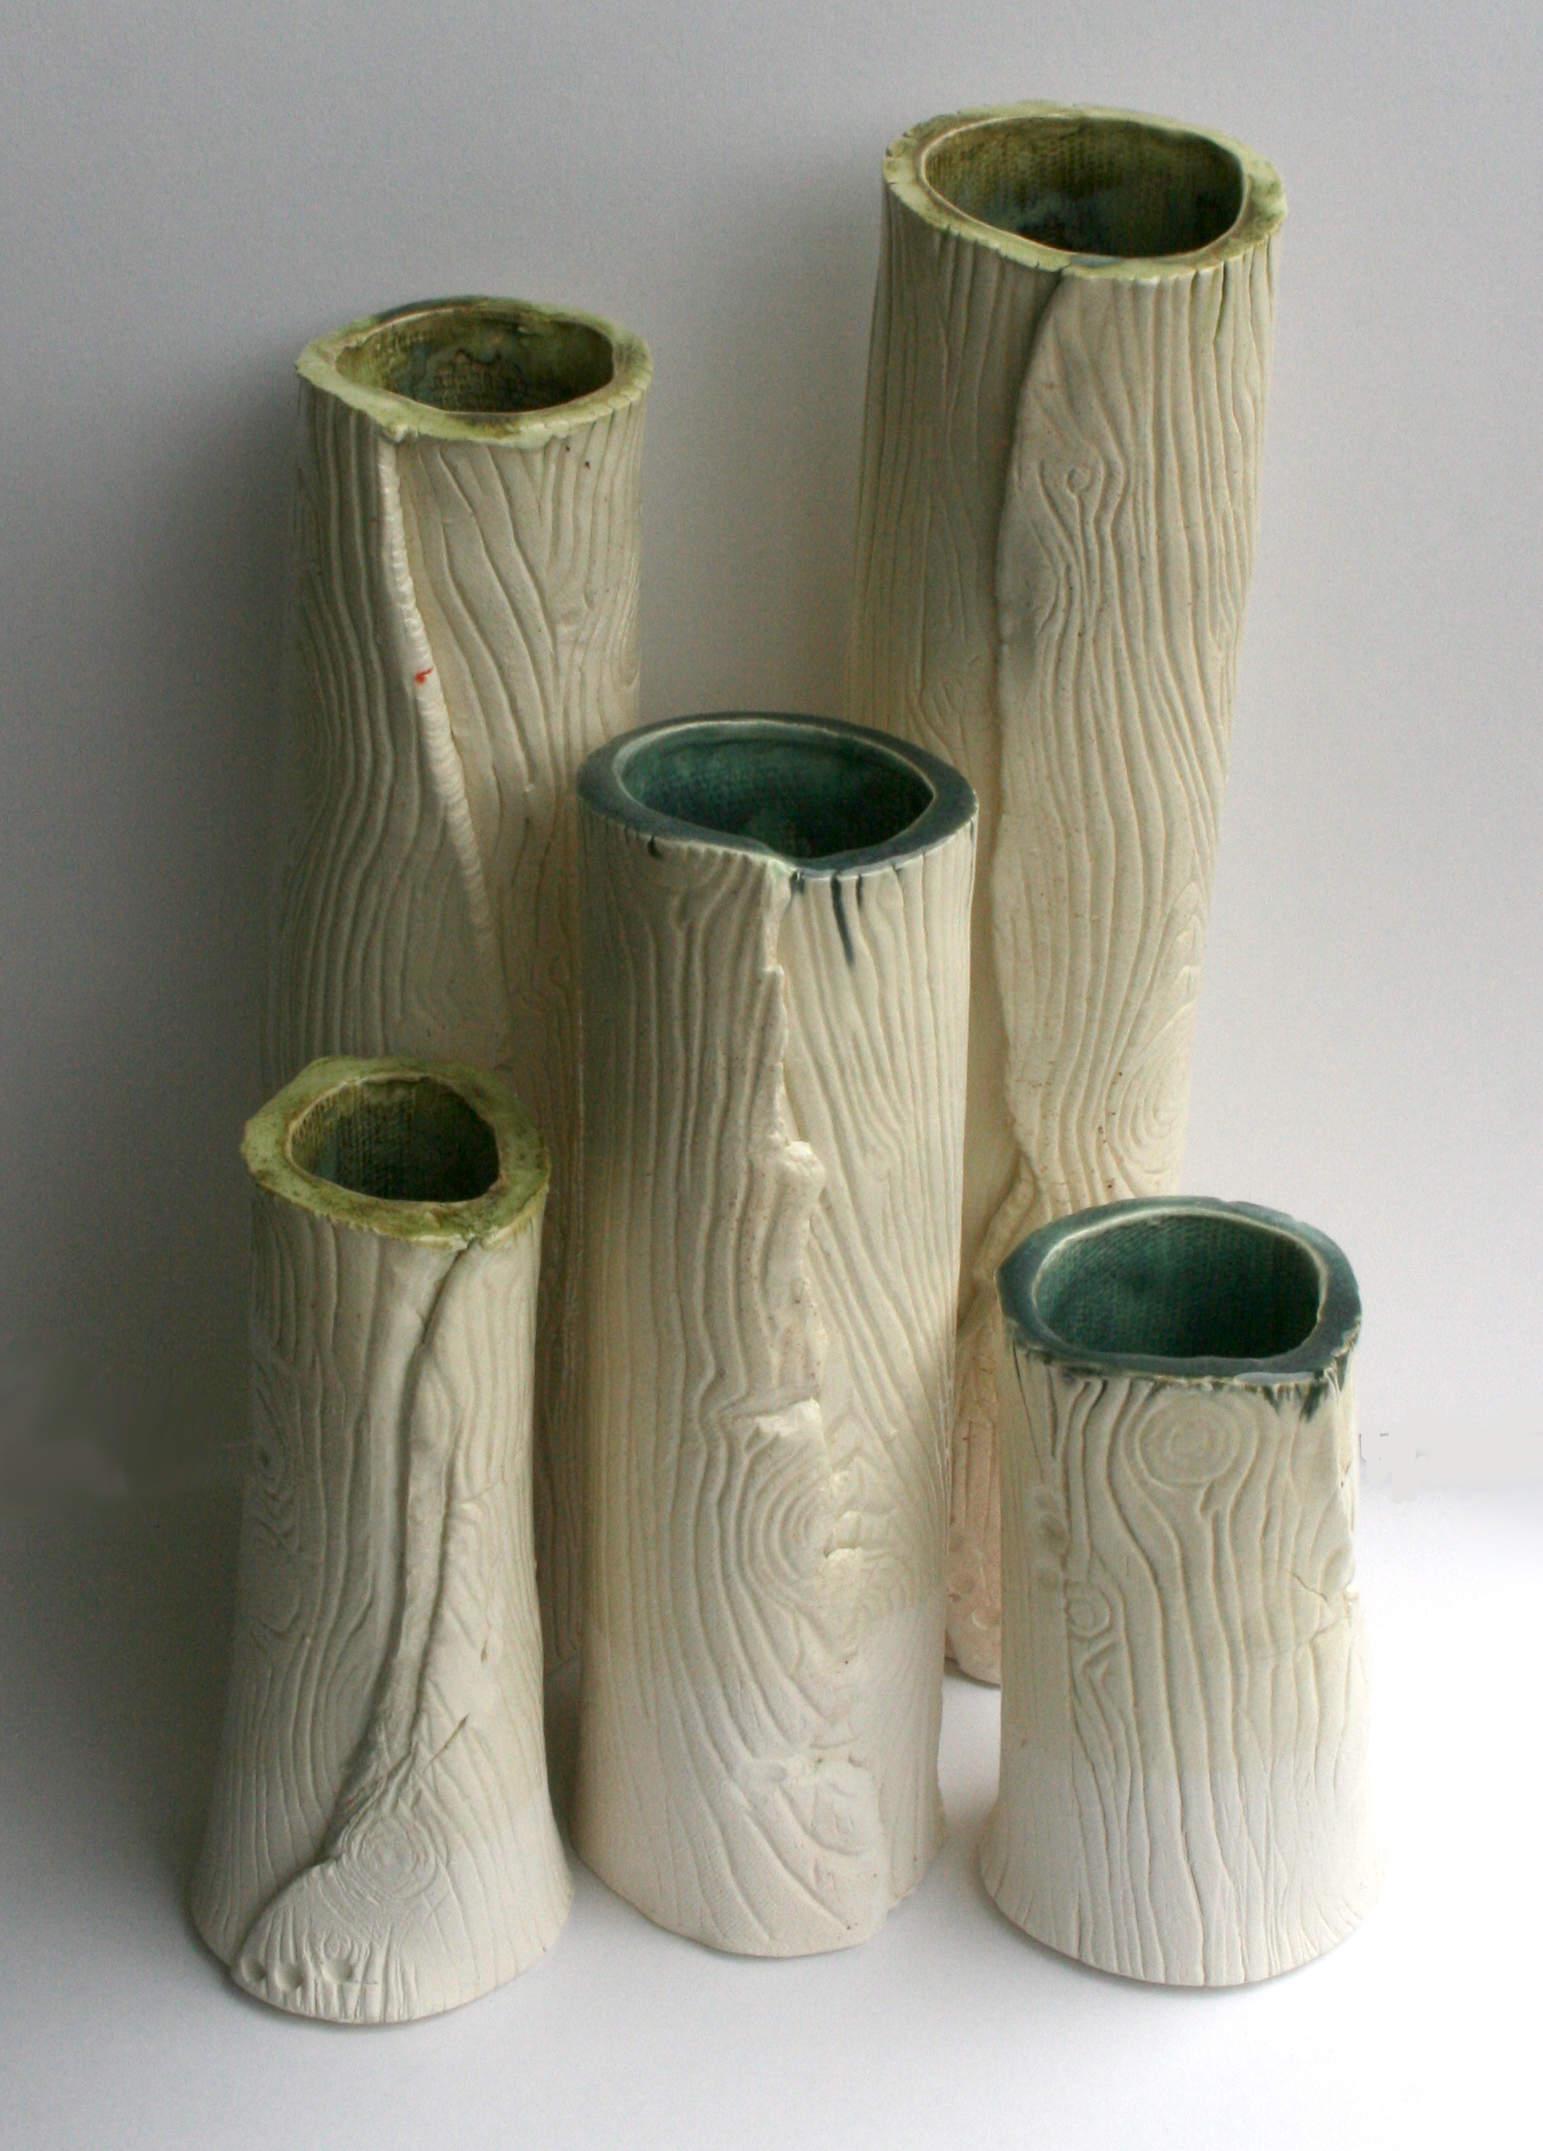 Handmade ceramics wood grain mugs and vases for Handmade pots design